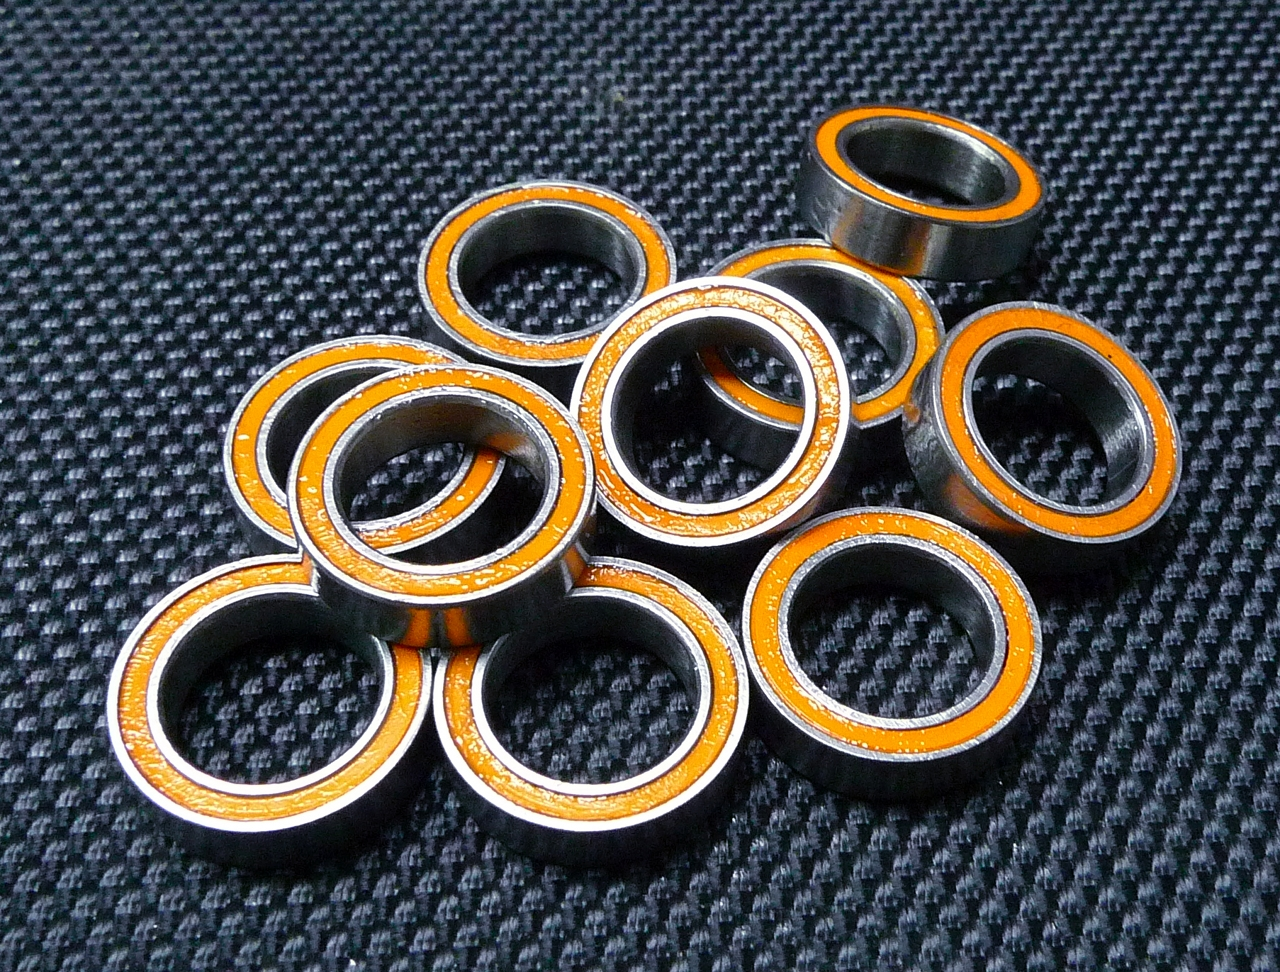 Double Metal Rubber Sealed Ball Bearing Orange 5x13x4 mm 695-2RS 4 PCS